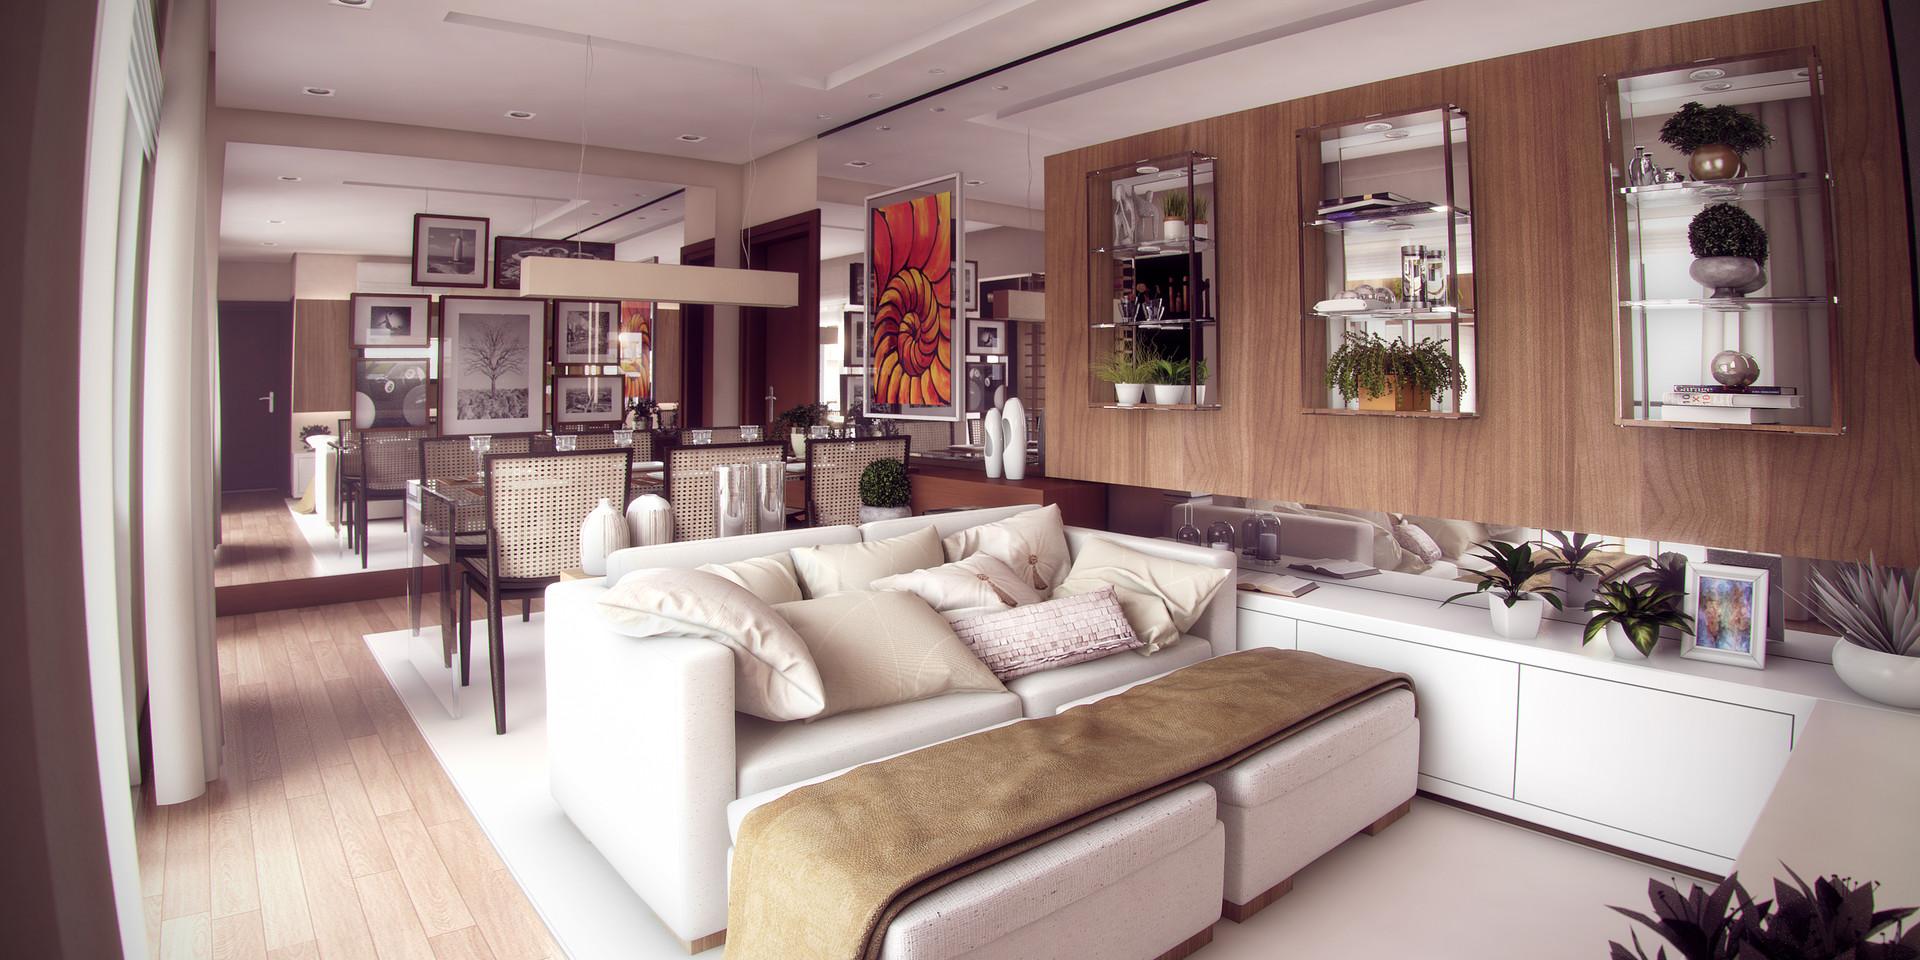 Ricardo eloy rick eloy living room